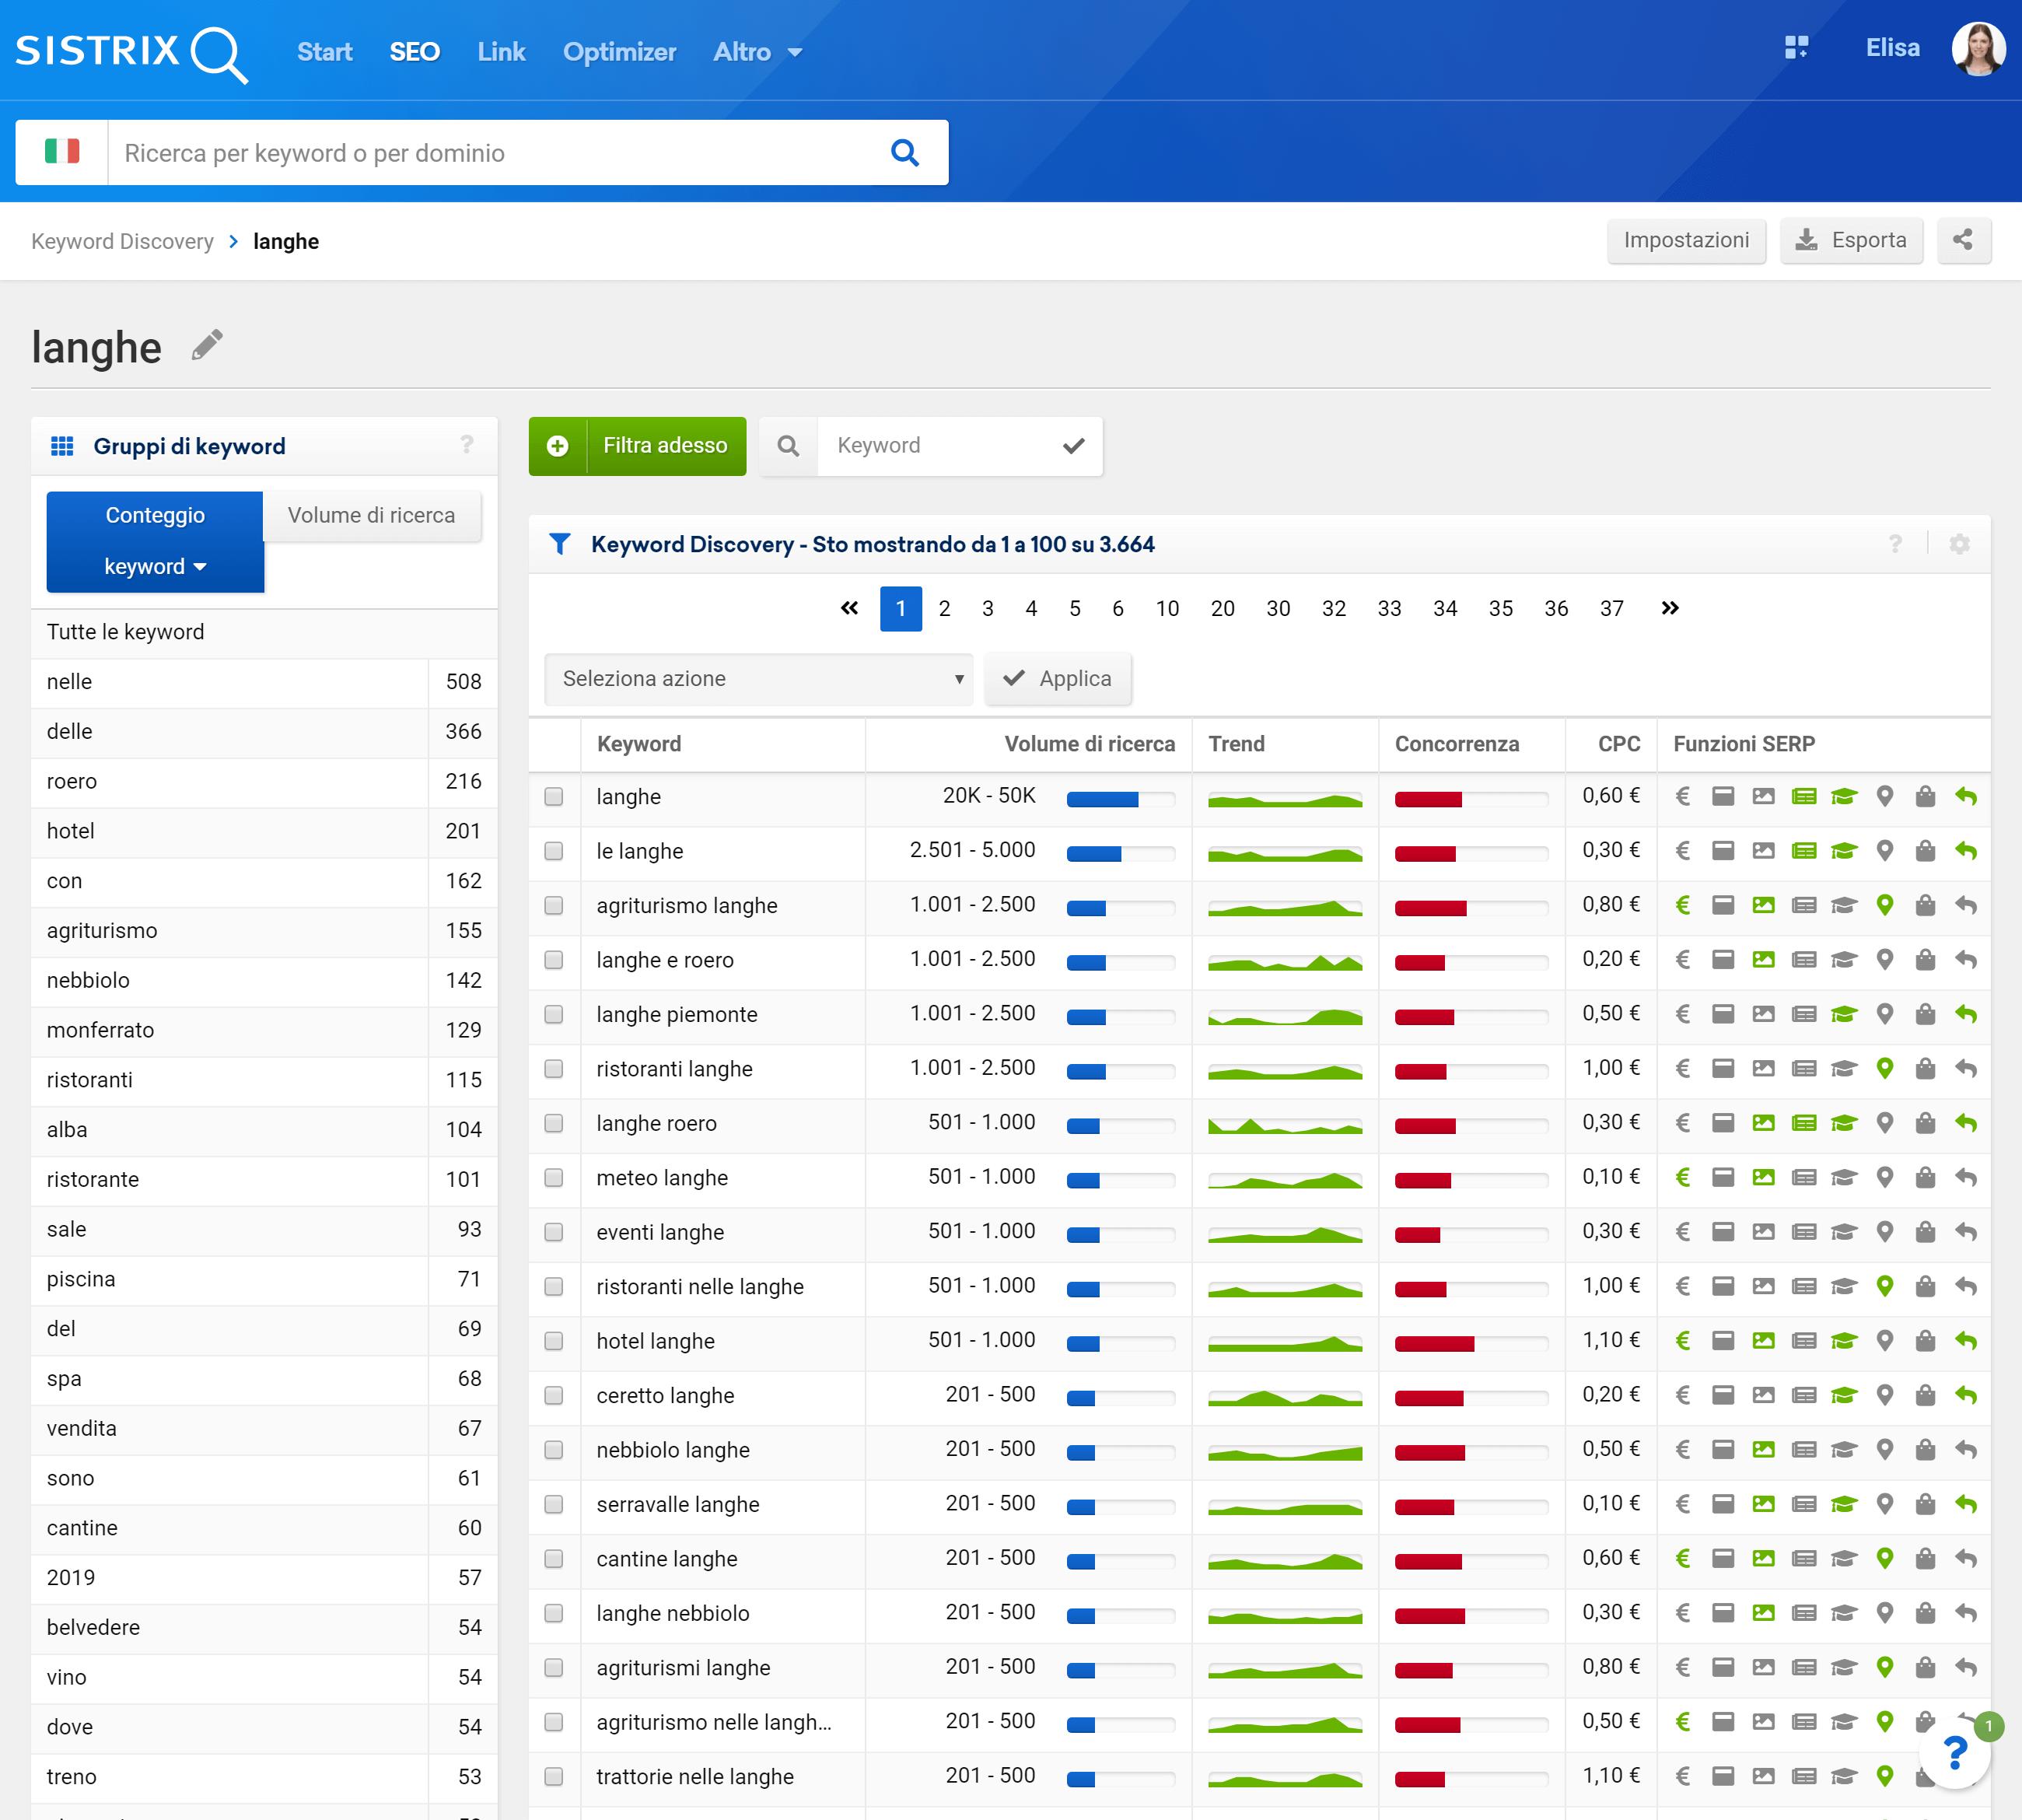 Esempio di Keyword Discovery nel Toolbox SISTRIX